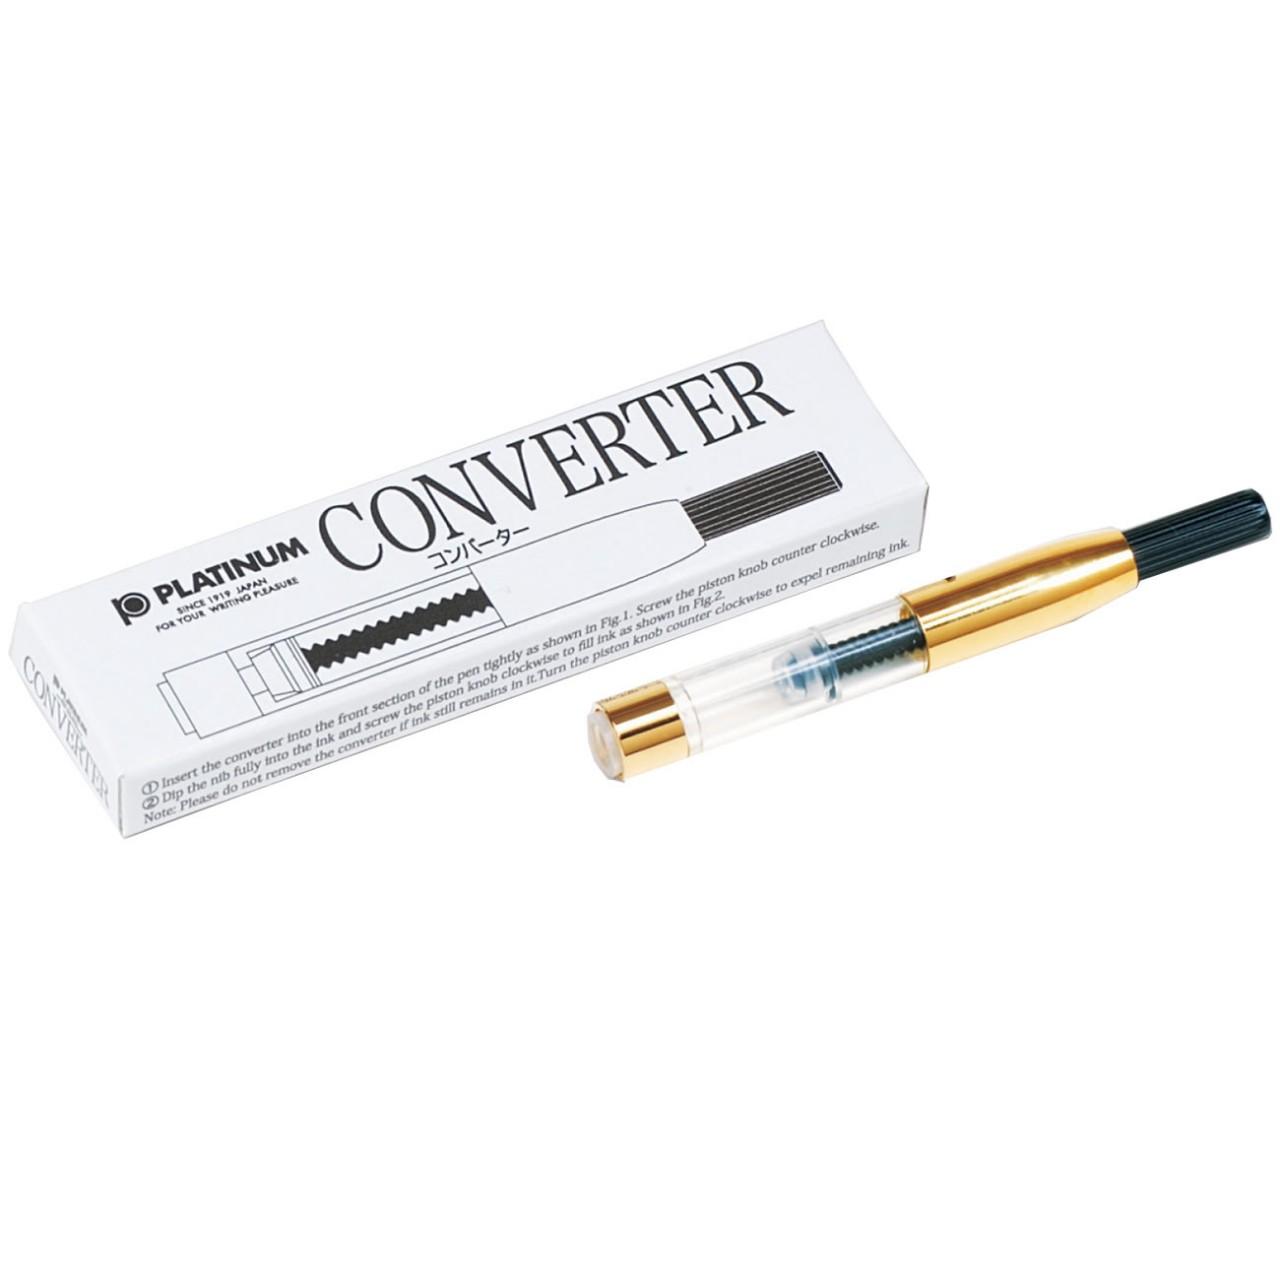 Platinum Gold converter for all Platinum FP